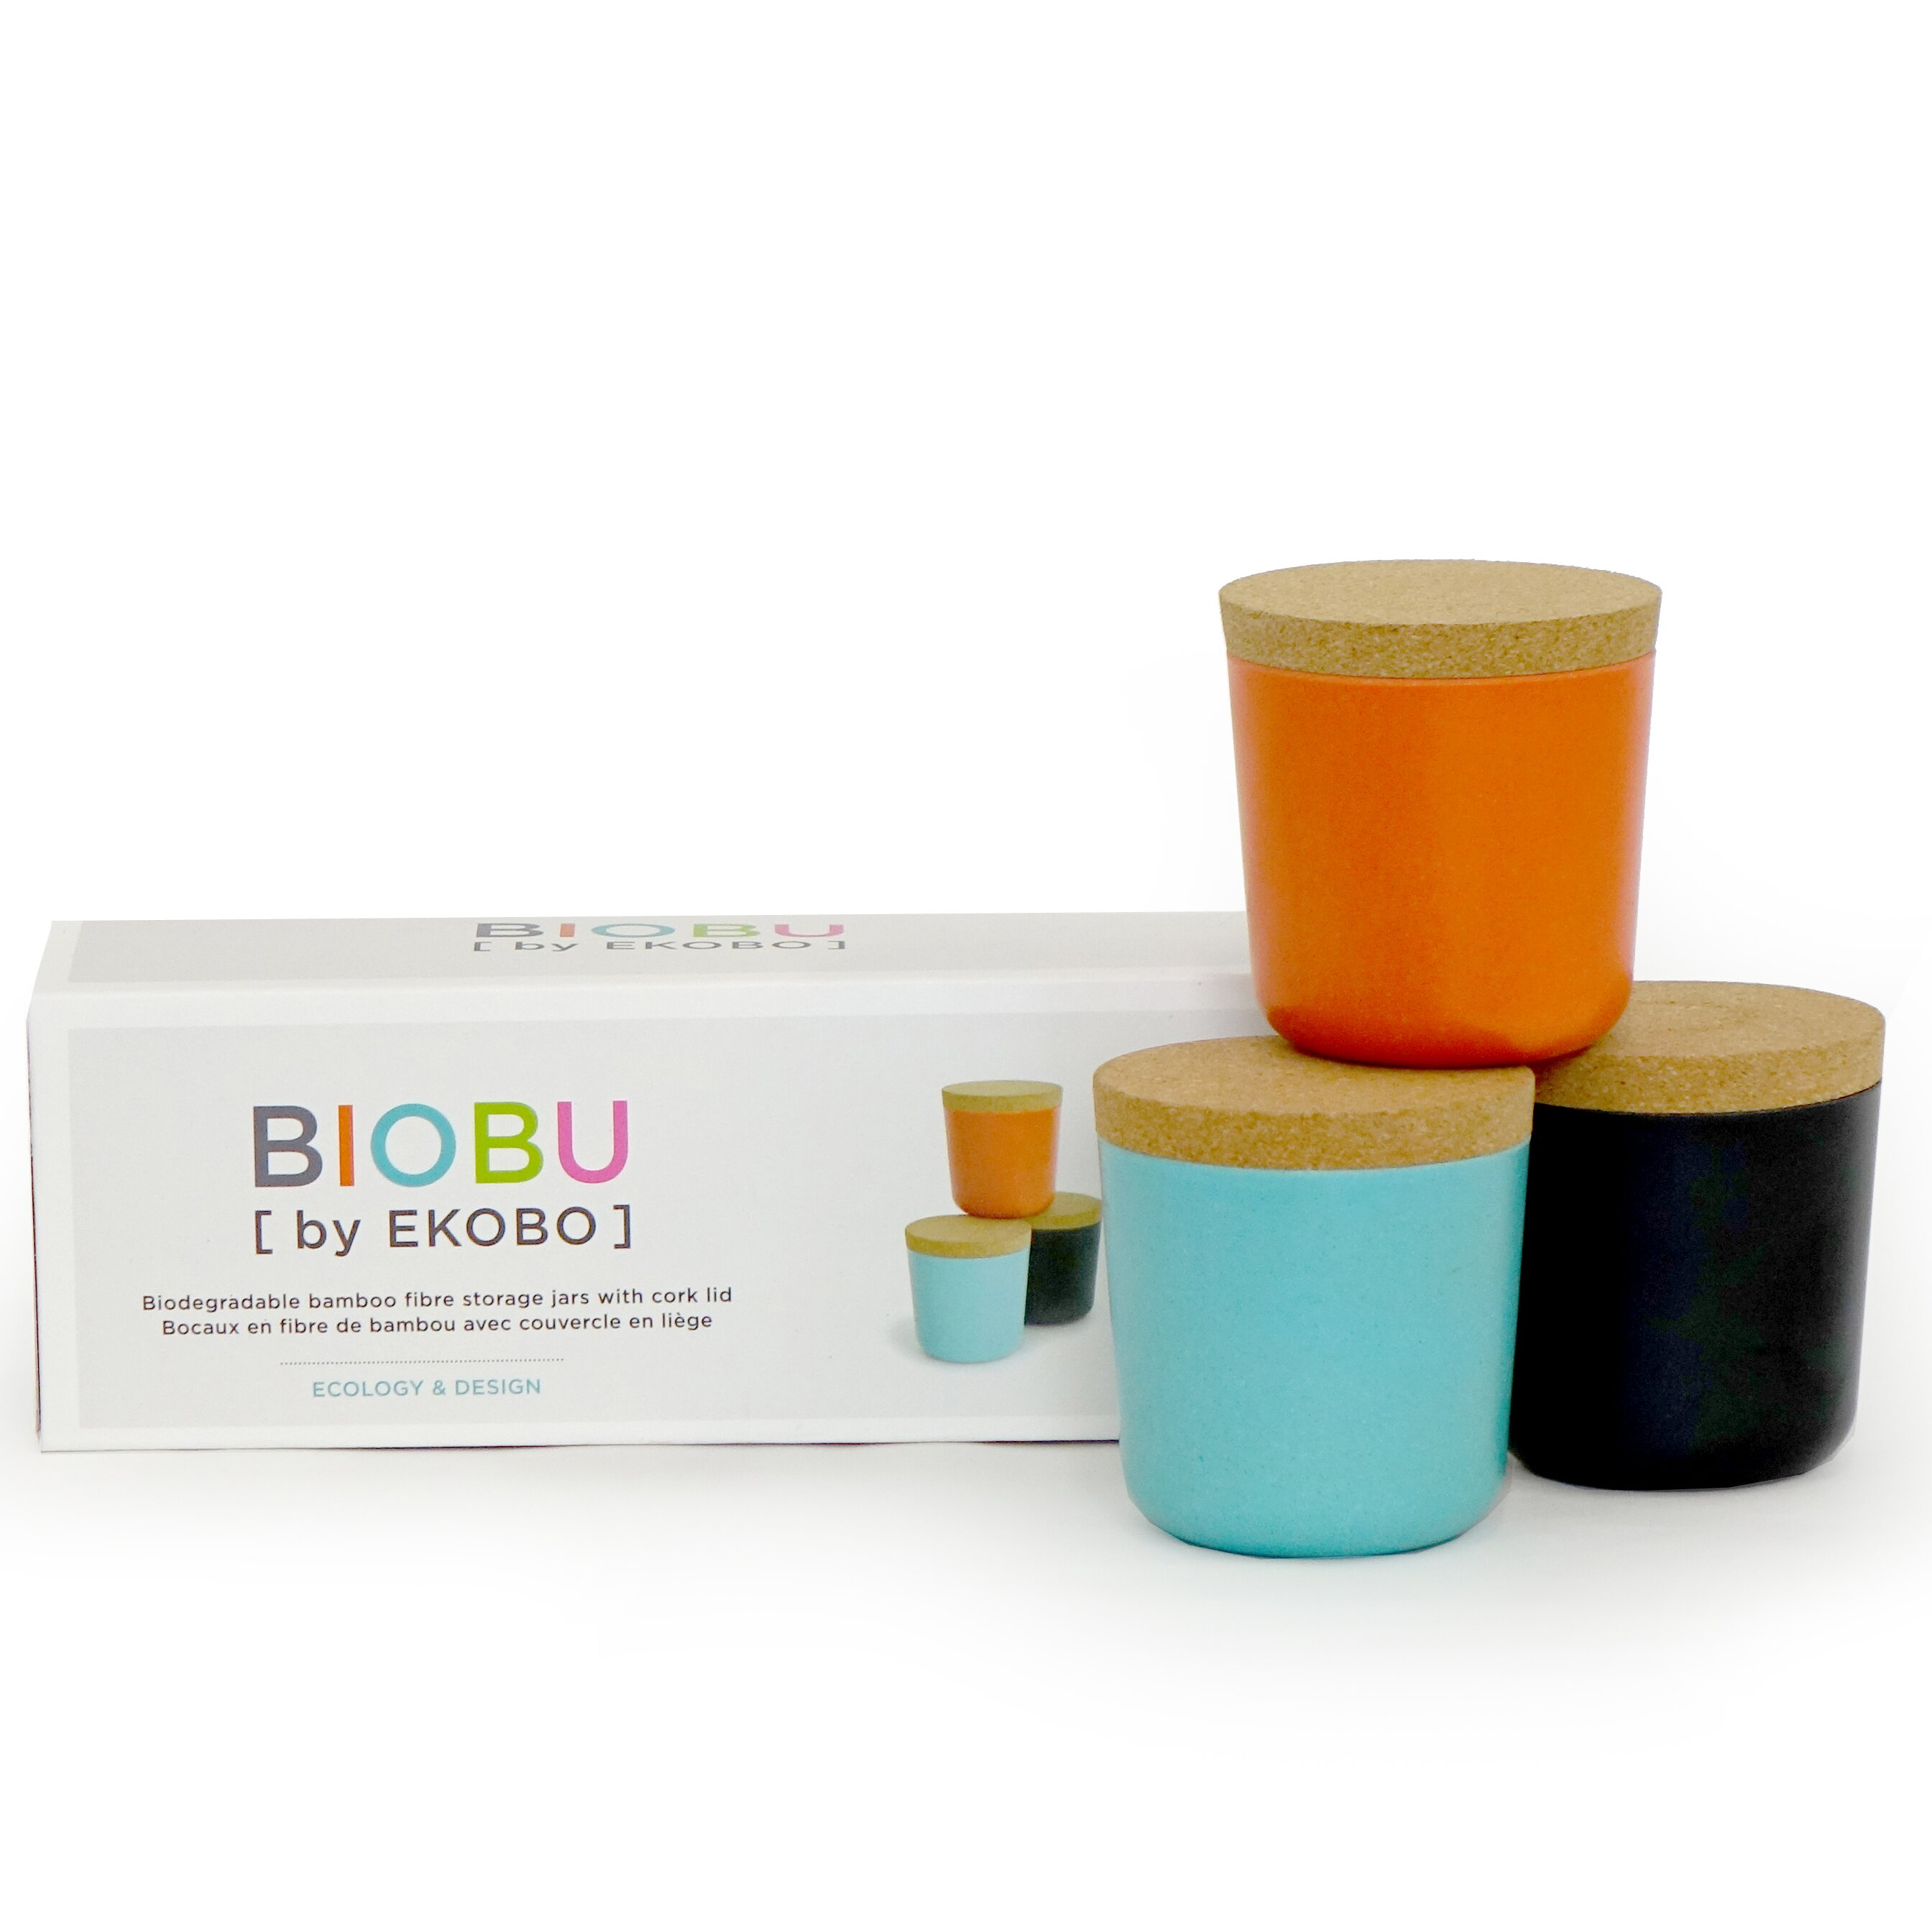 biobu by ekobo gusto 8 oz storage jar set v2 reviews wayfair. Black Bedroom Furniture Sets. Home Design Ideas